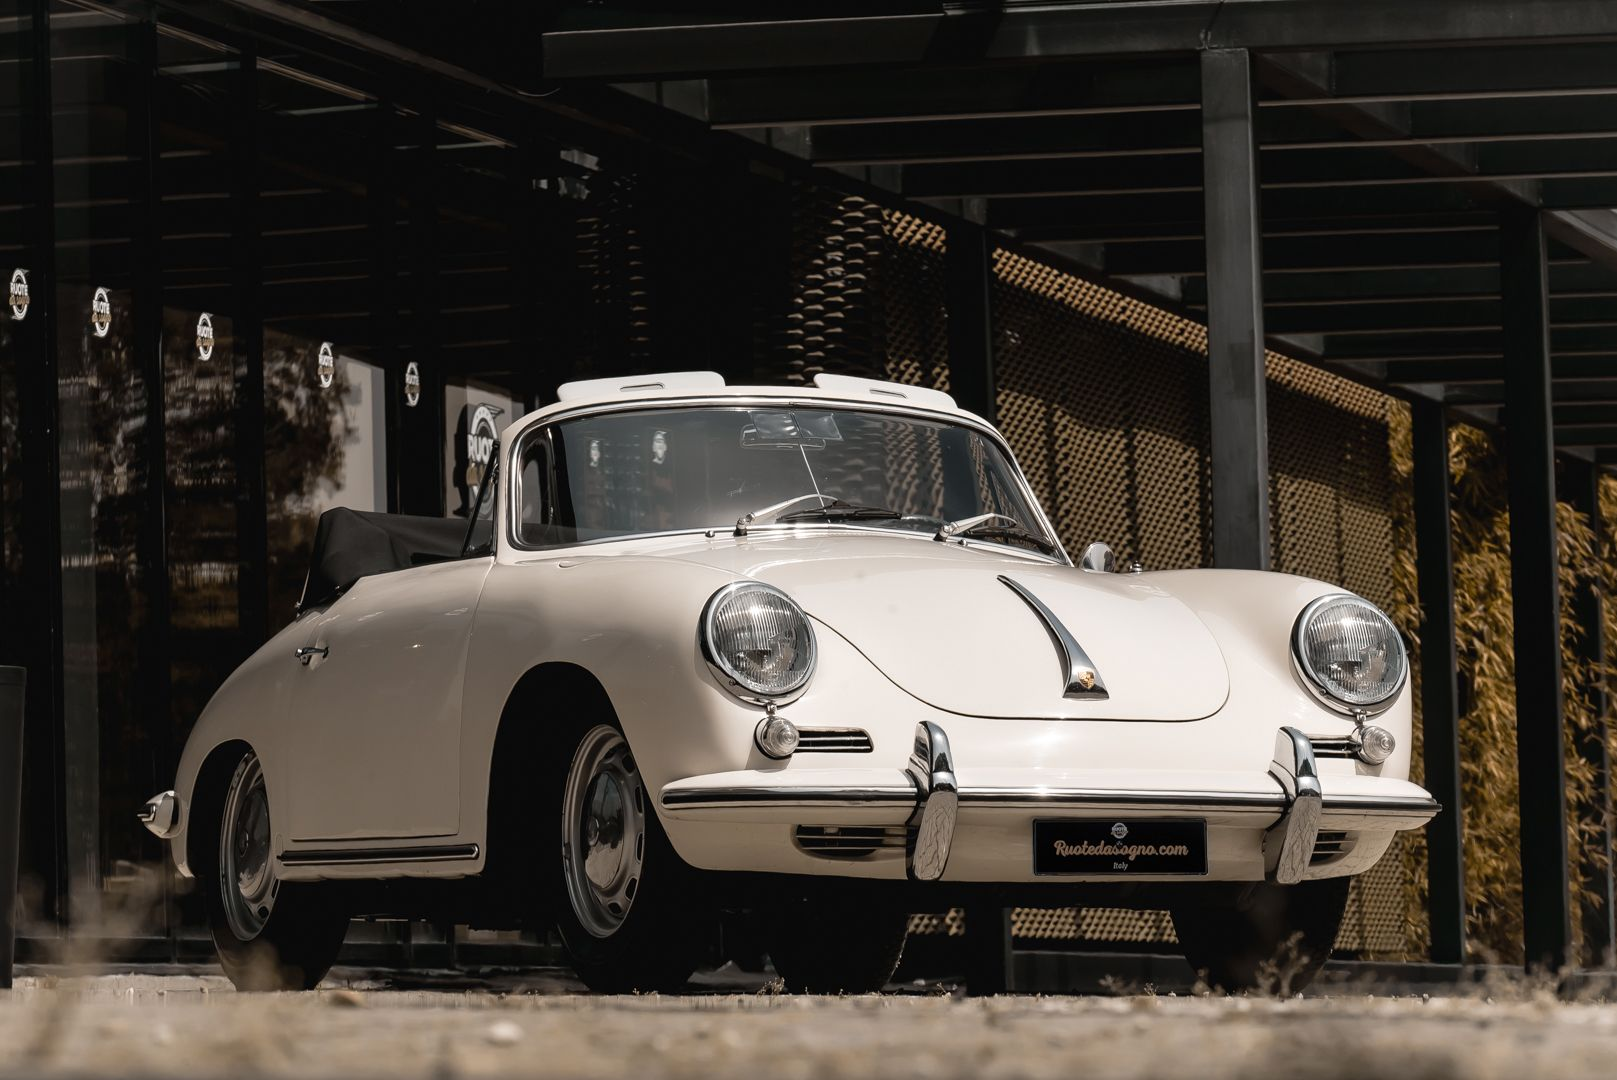 1964 PORSCHE 356 C Cabriolet 1600 SC 75434